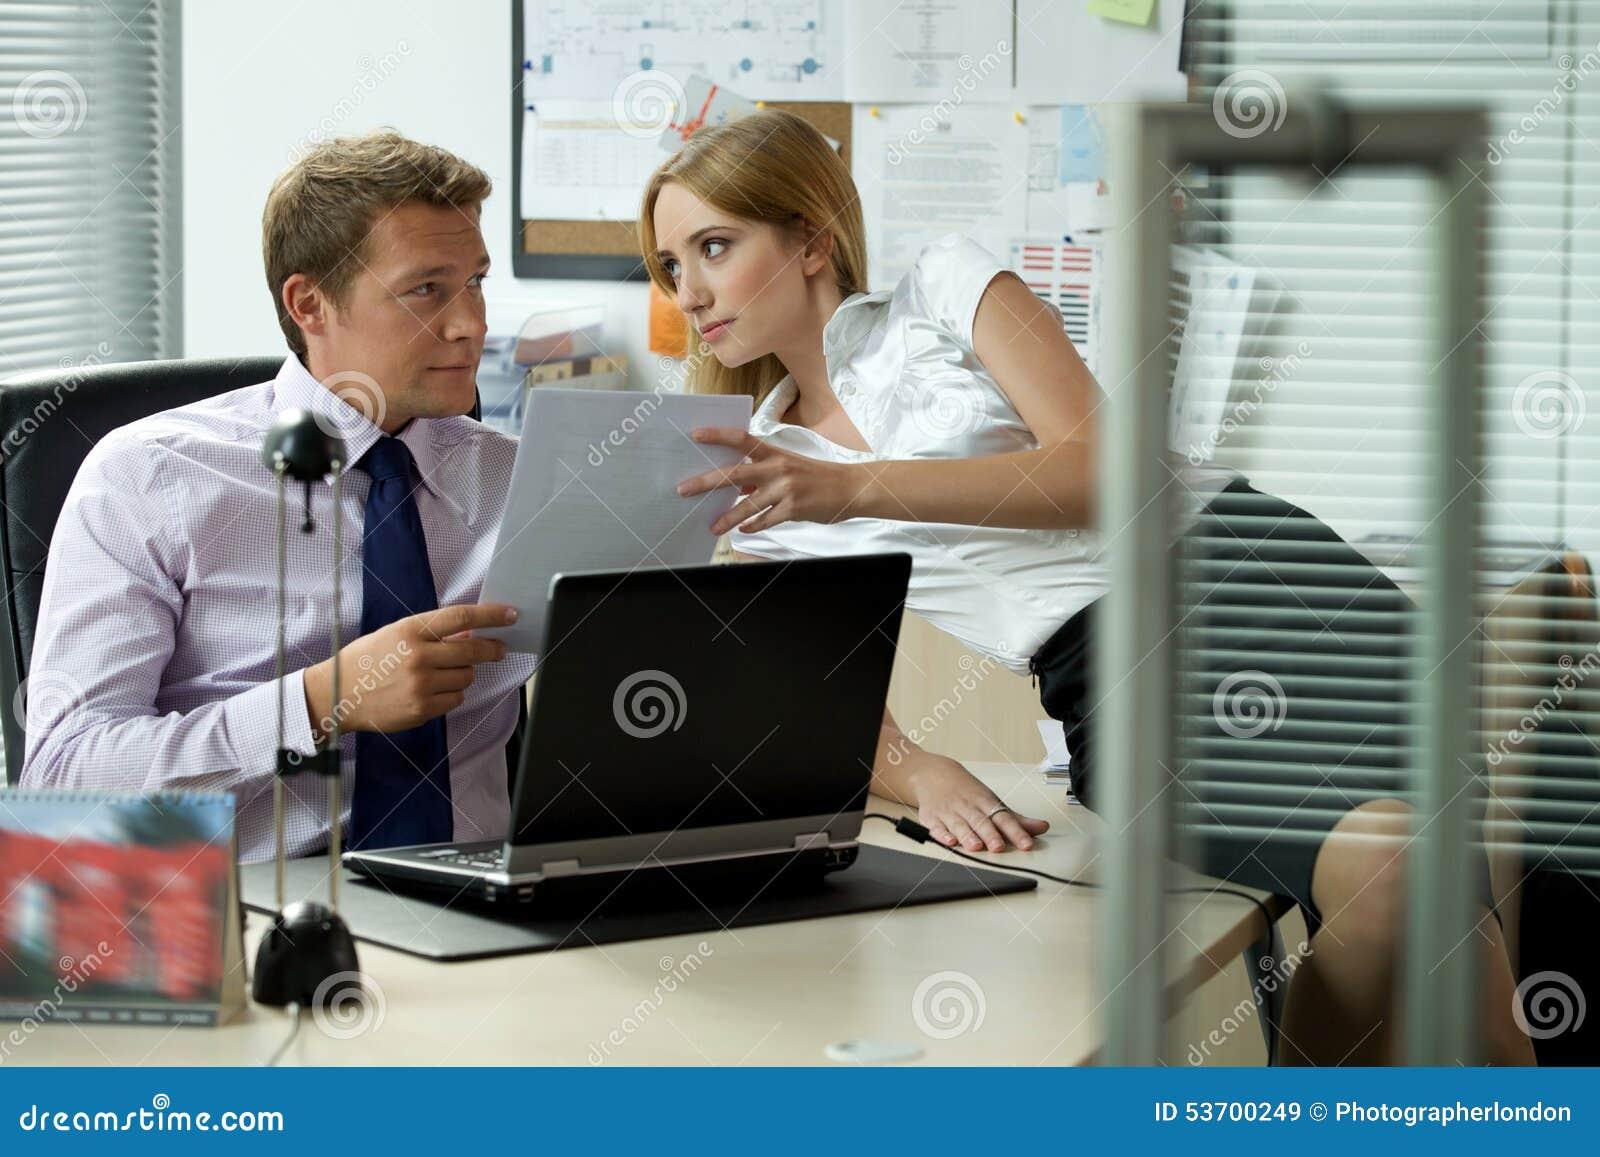 love office